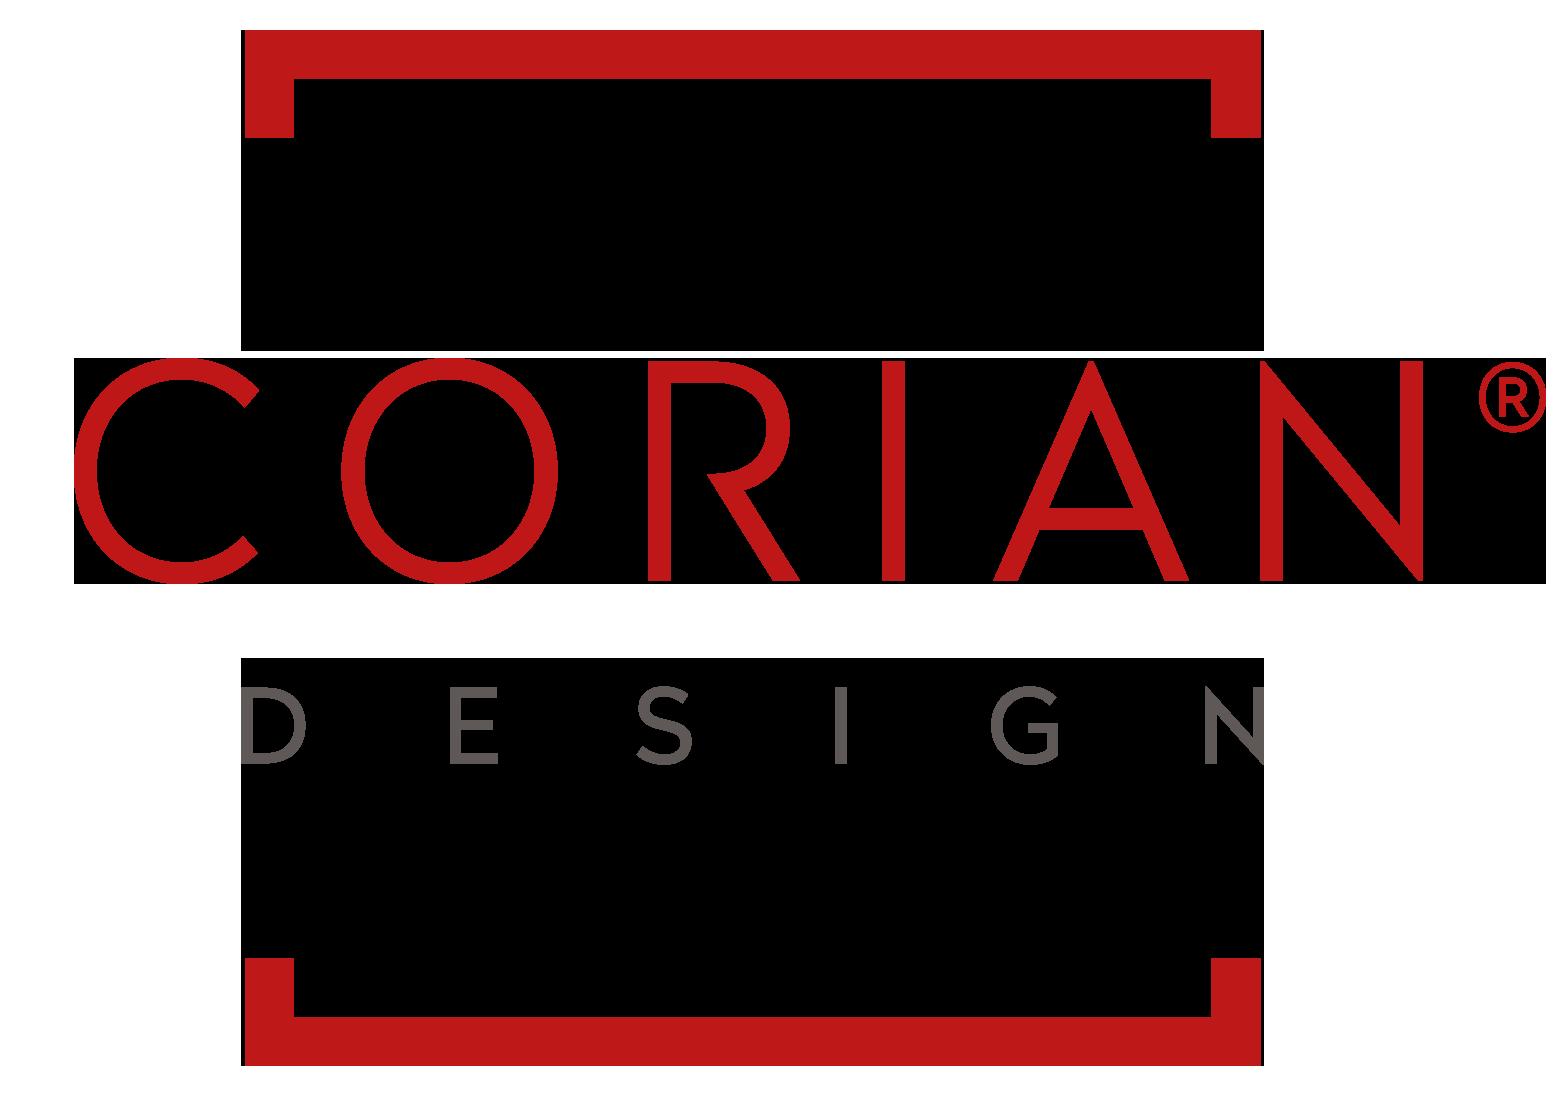 Corian New Logo 2017